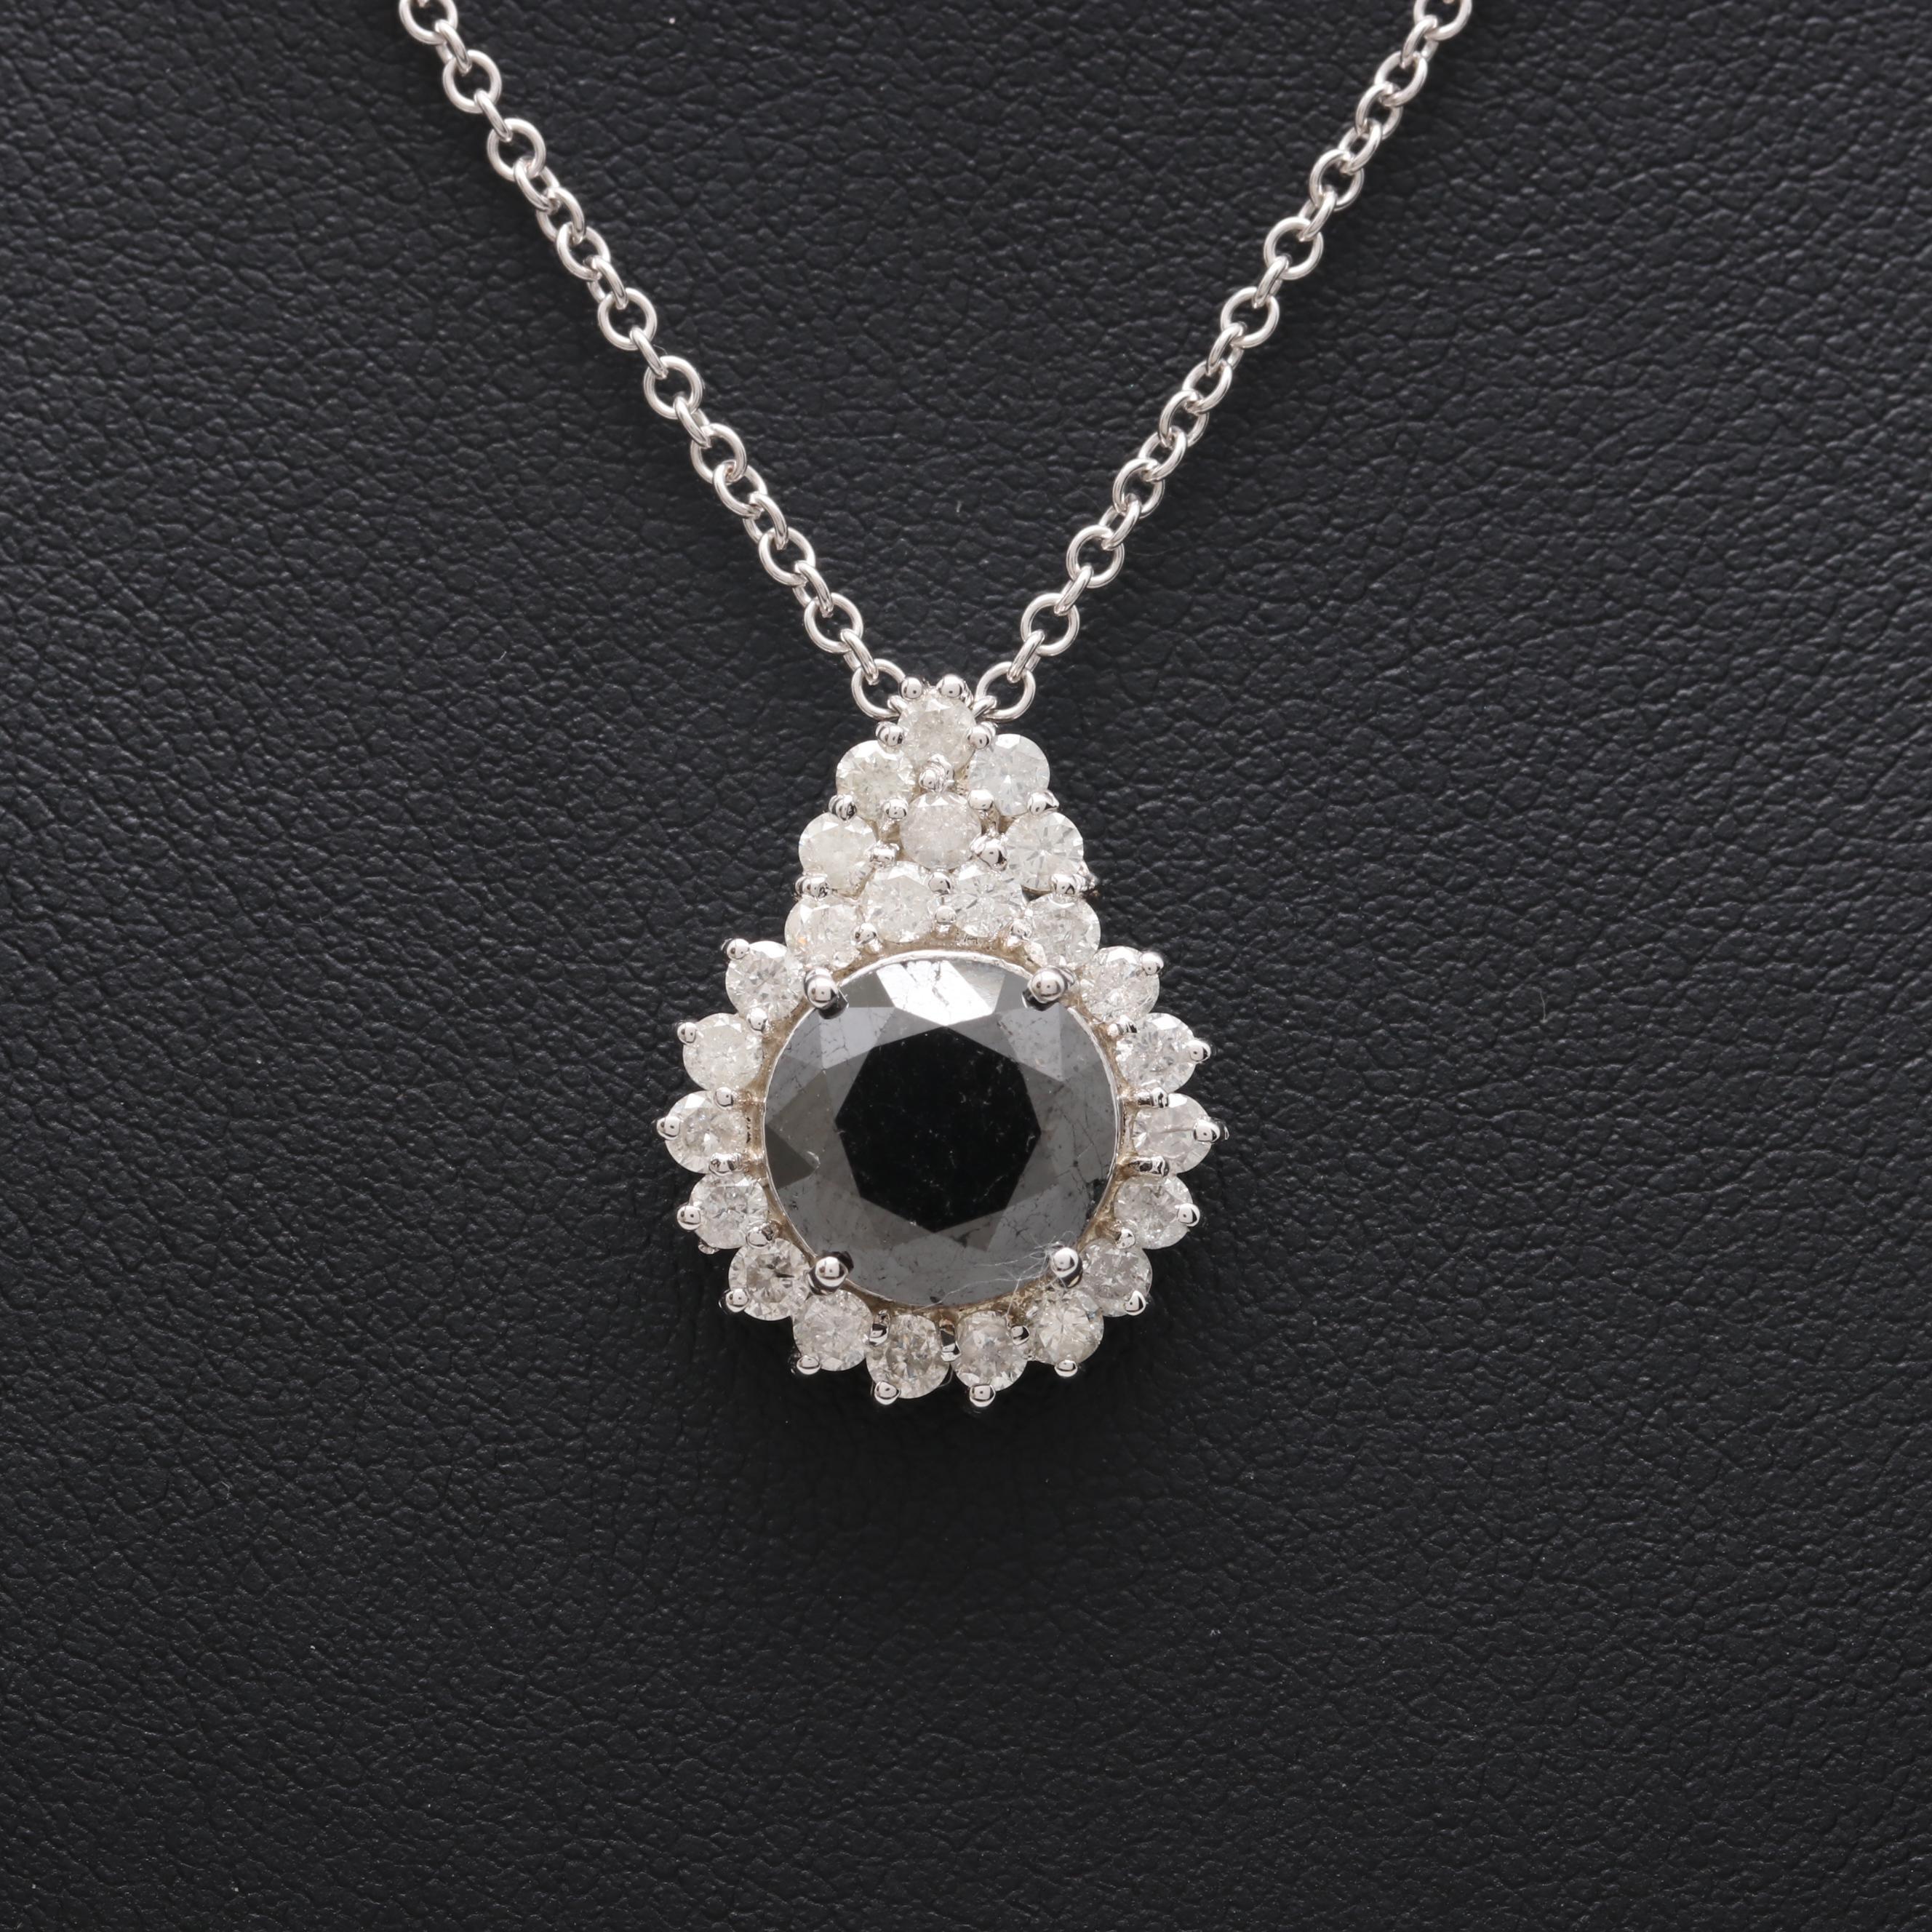 14K White Gold 4.23 CTW Diamond Pendant Necklace Including Black Diamond